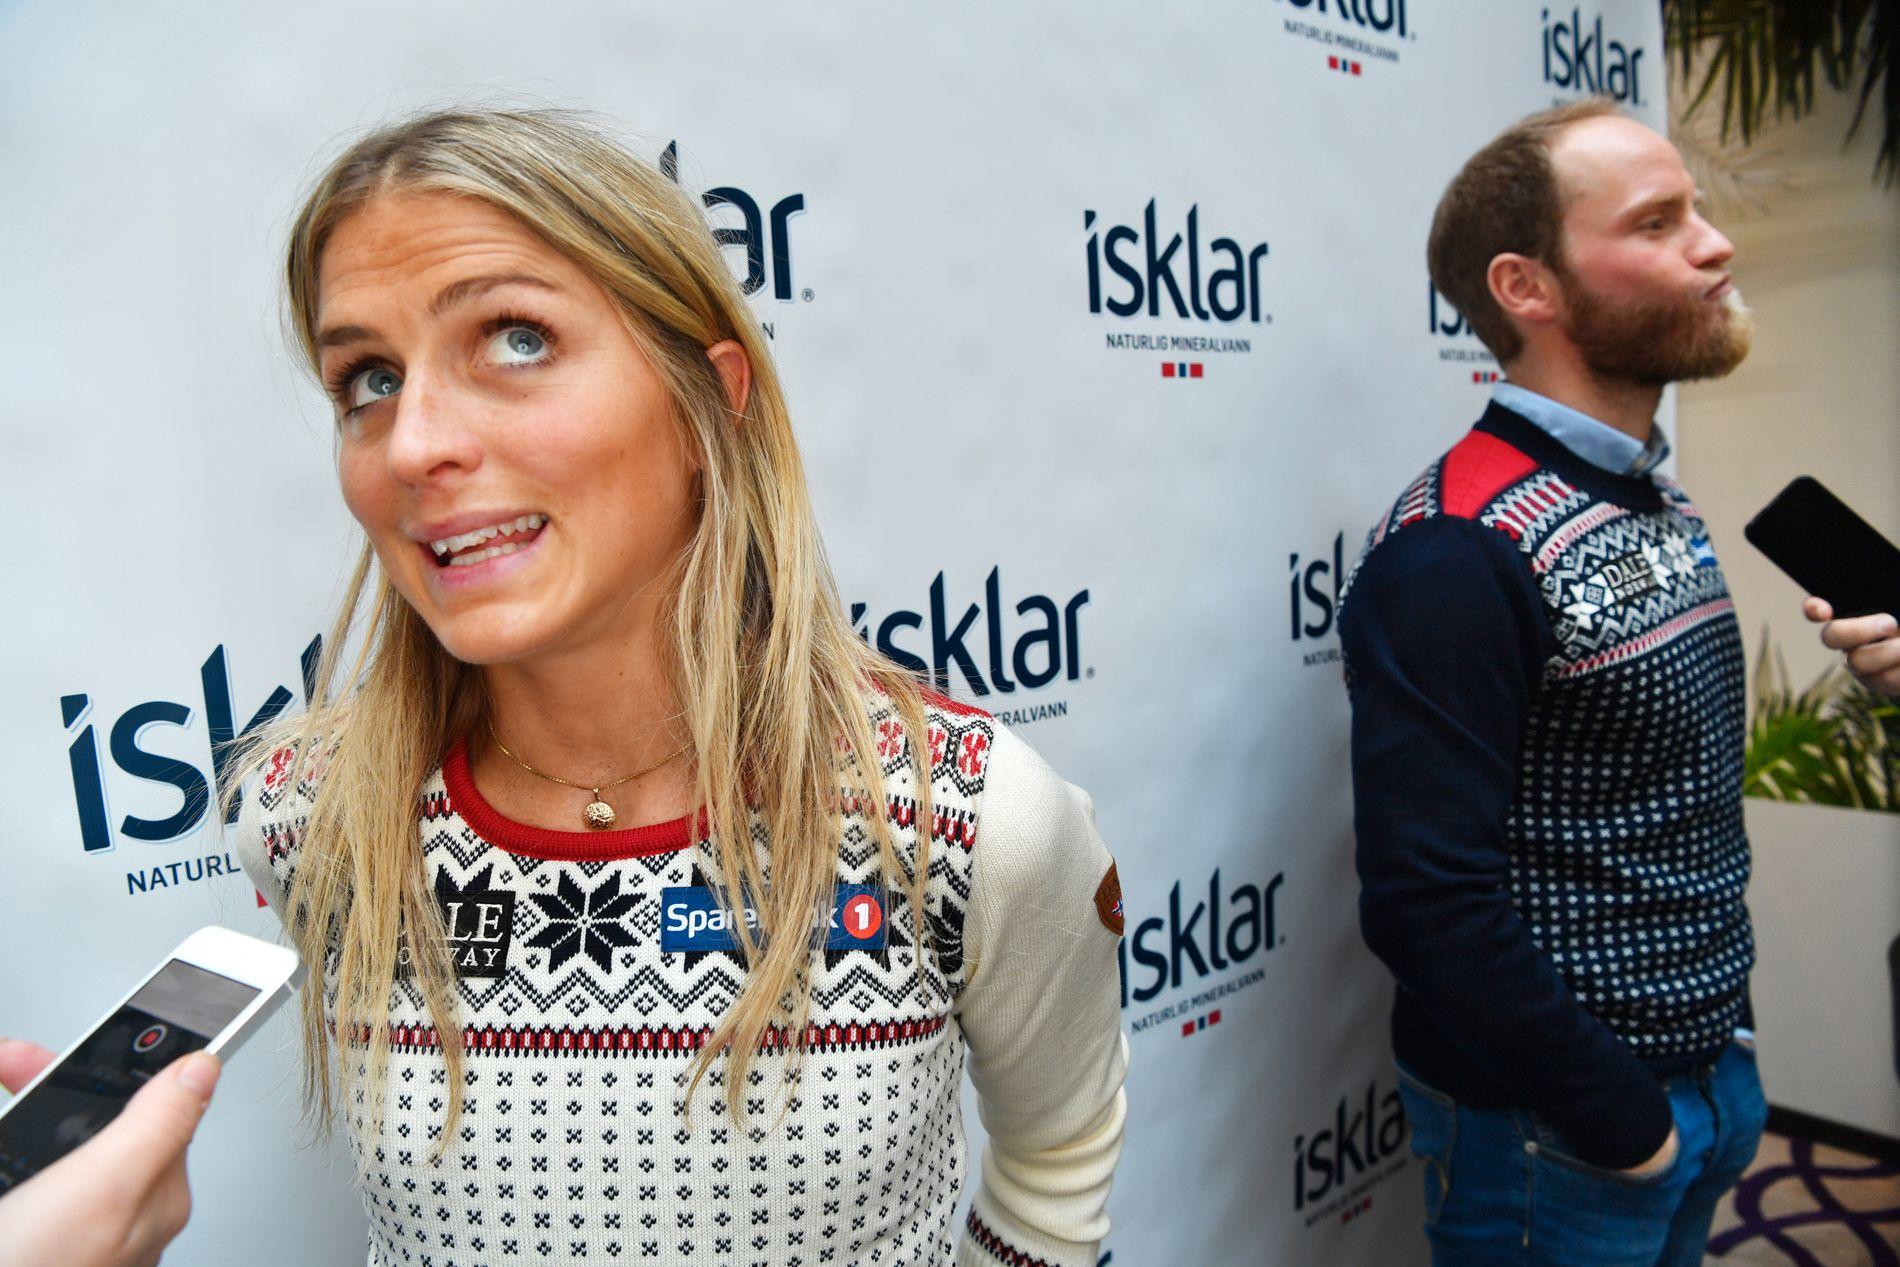 Sundby saken har kostet skiforbundet 3,3 millioner kroner